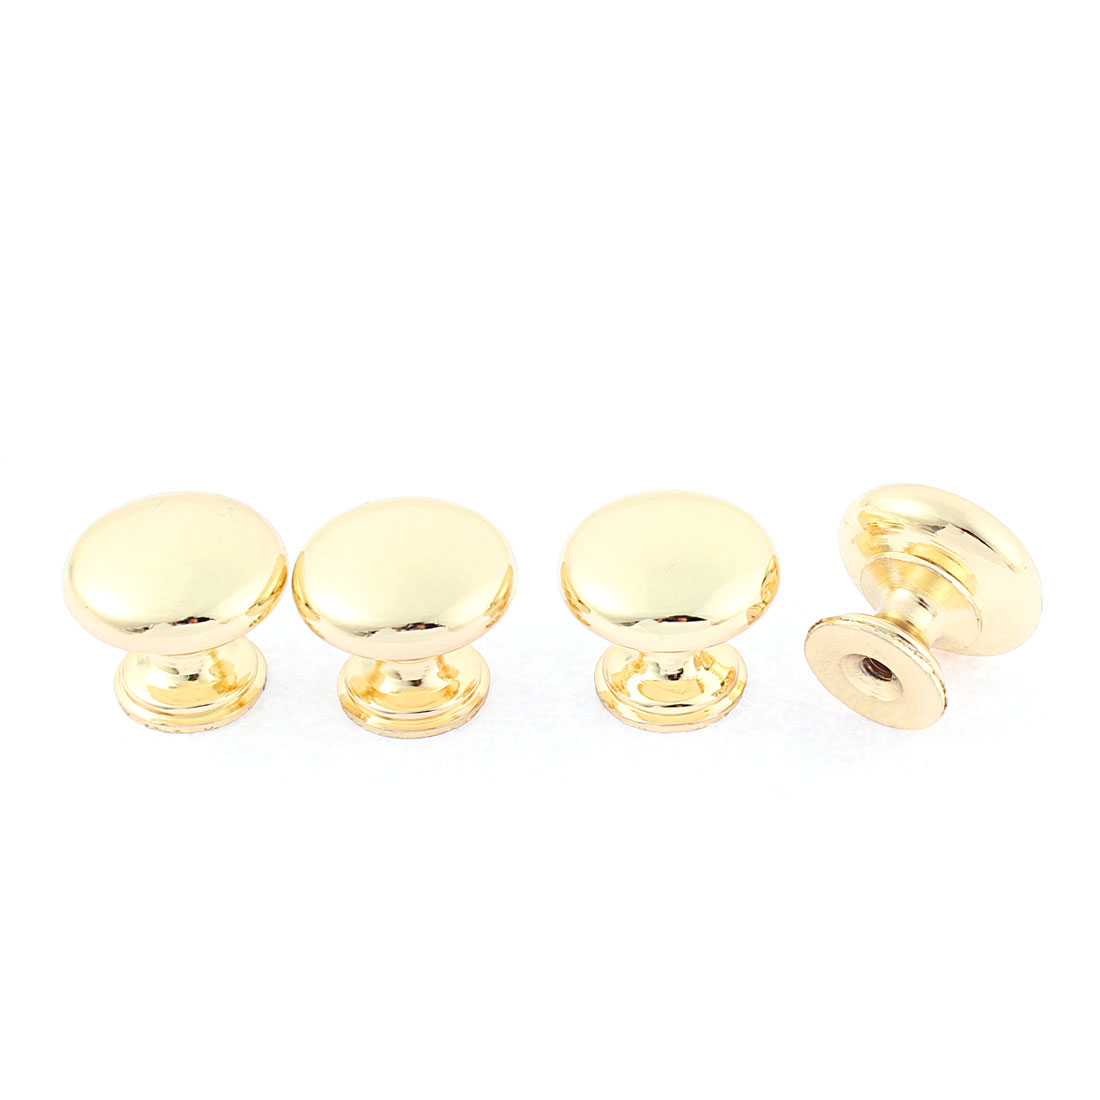 Kitchen Cabinet Drawer Round Knobs Gold Tone 25mm Dia 4Pcs